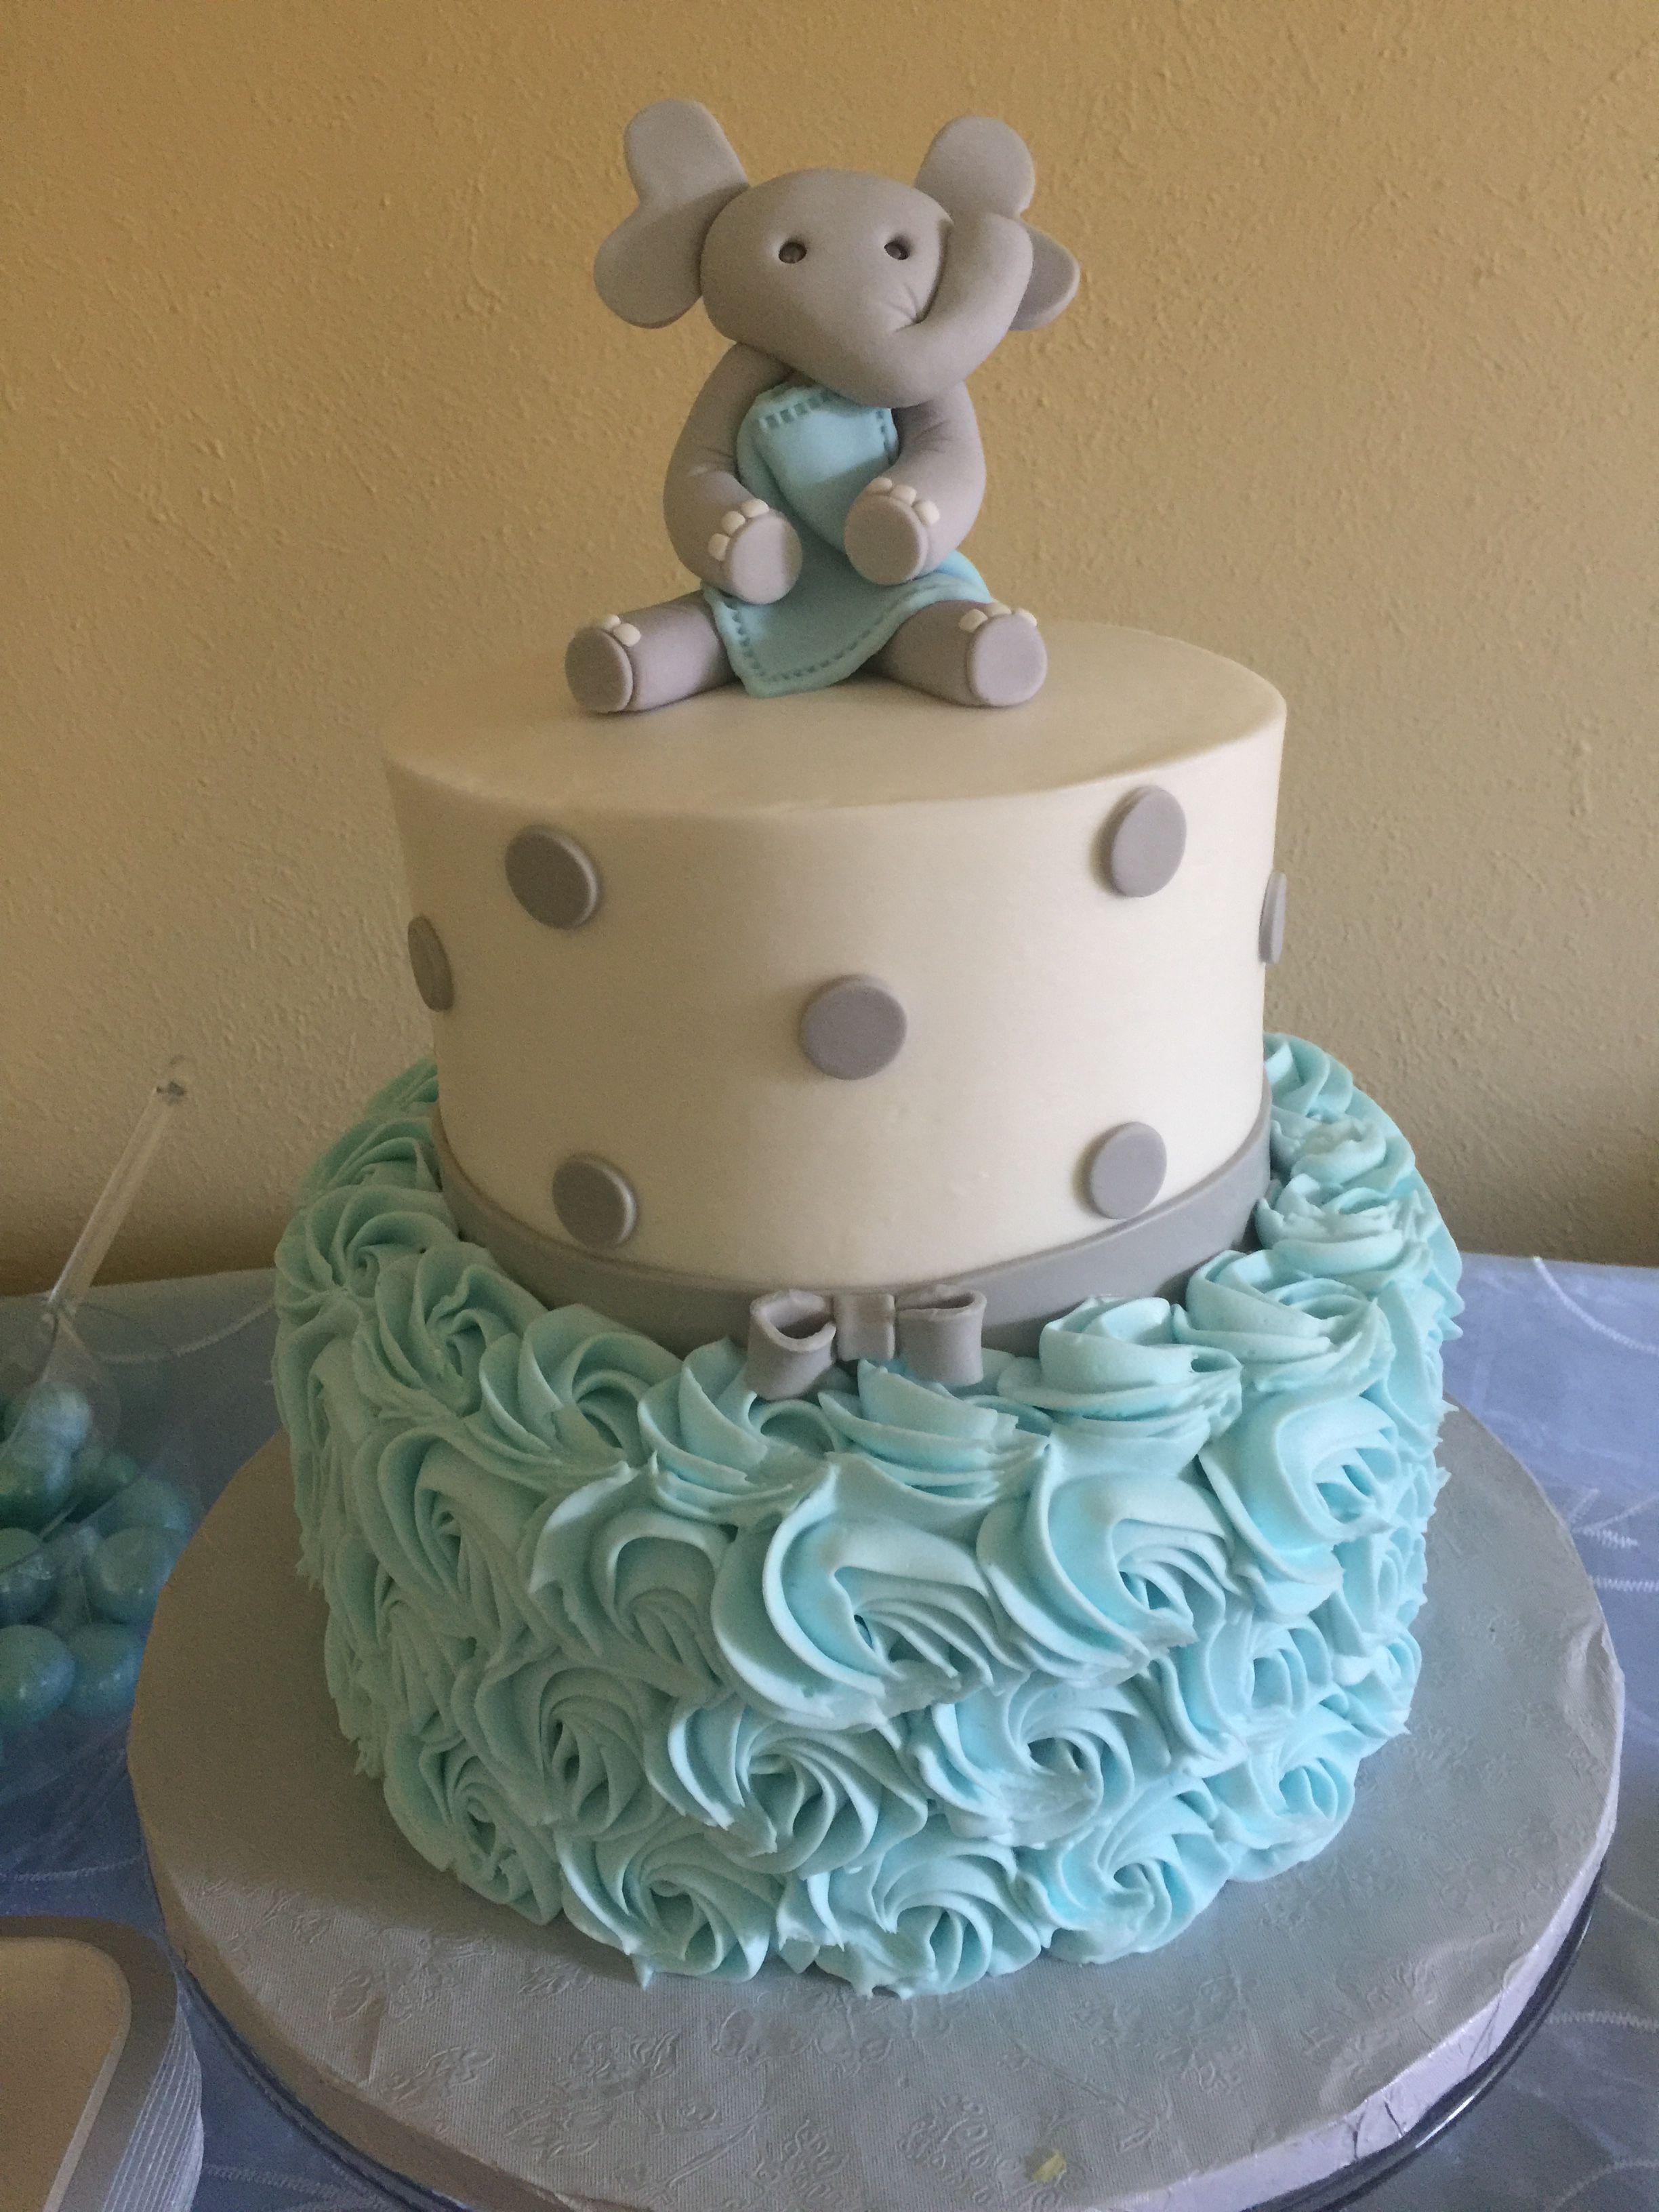 Pasteles Para Baby Shower Niño Elefante : pasteles, shower, niño, elefante, Martha, Teniente, Cakes, Elephant, Shower, Theme,, Cake,